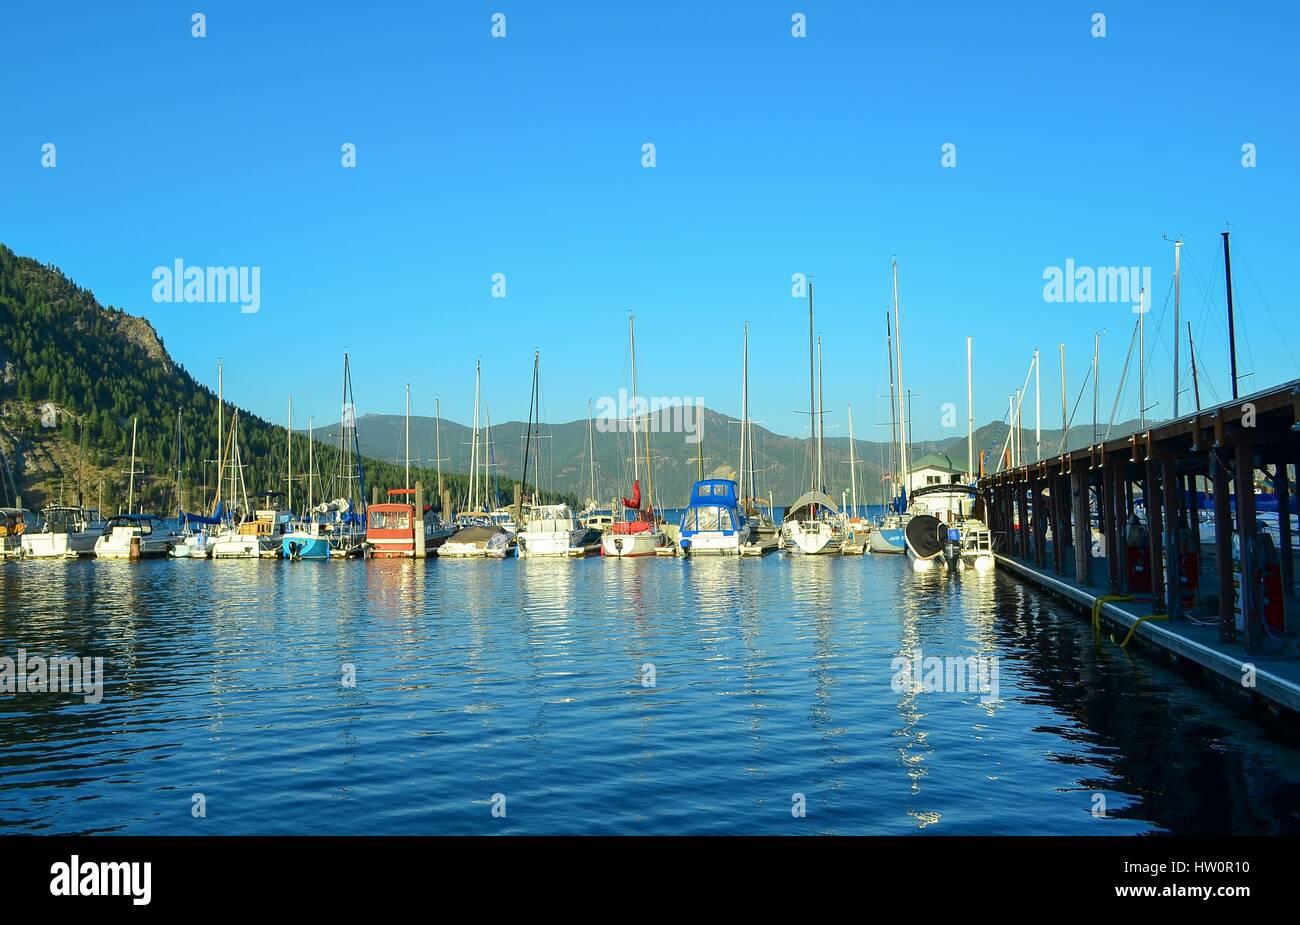 Lake Pend O'Reille, Idaho (Bayview Marina) - Stock Image